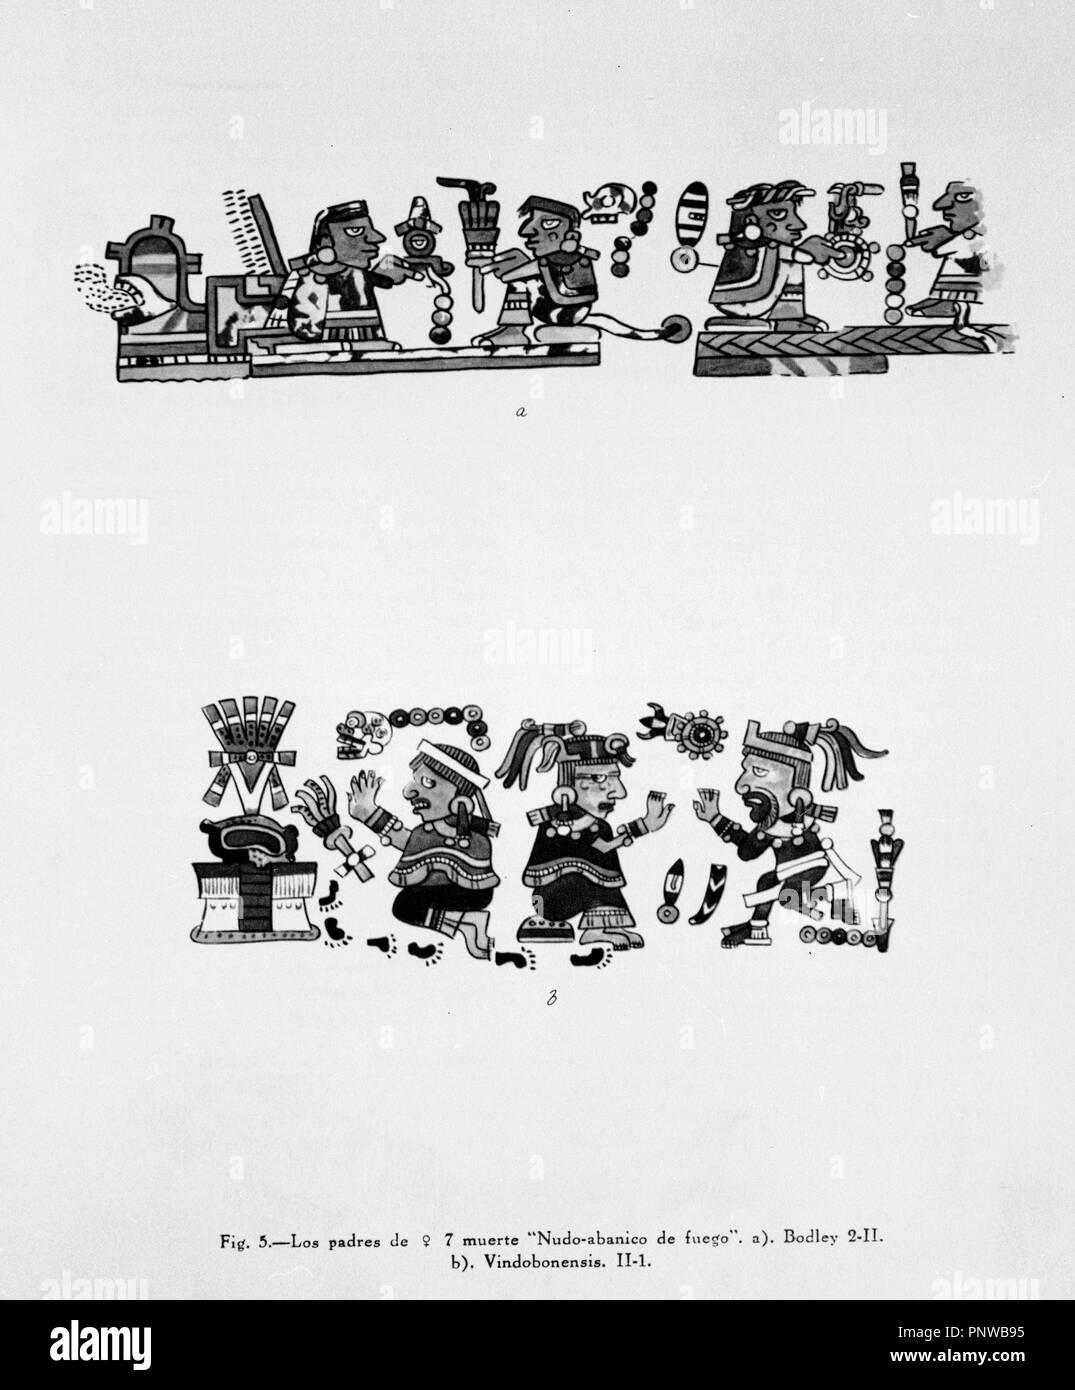 GRABADO - PICTOGRAMAS DE DOS MANUSCRITOS MESOAMERICANOS - A) CODICE BODLEY B) CÓDICE VINDOBONENSIS - SIGLO XVI. Ubicación: EL INSTITUTO DE COOPERACION IBEROAMERICANA. MADRID. España. Foto de stock